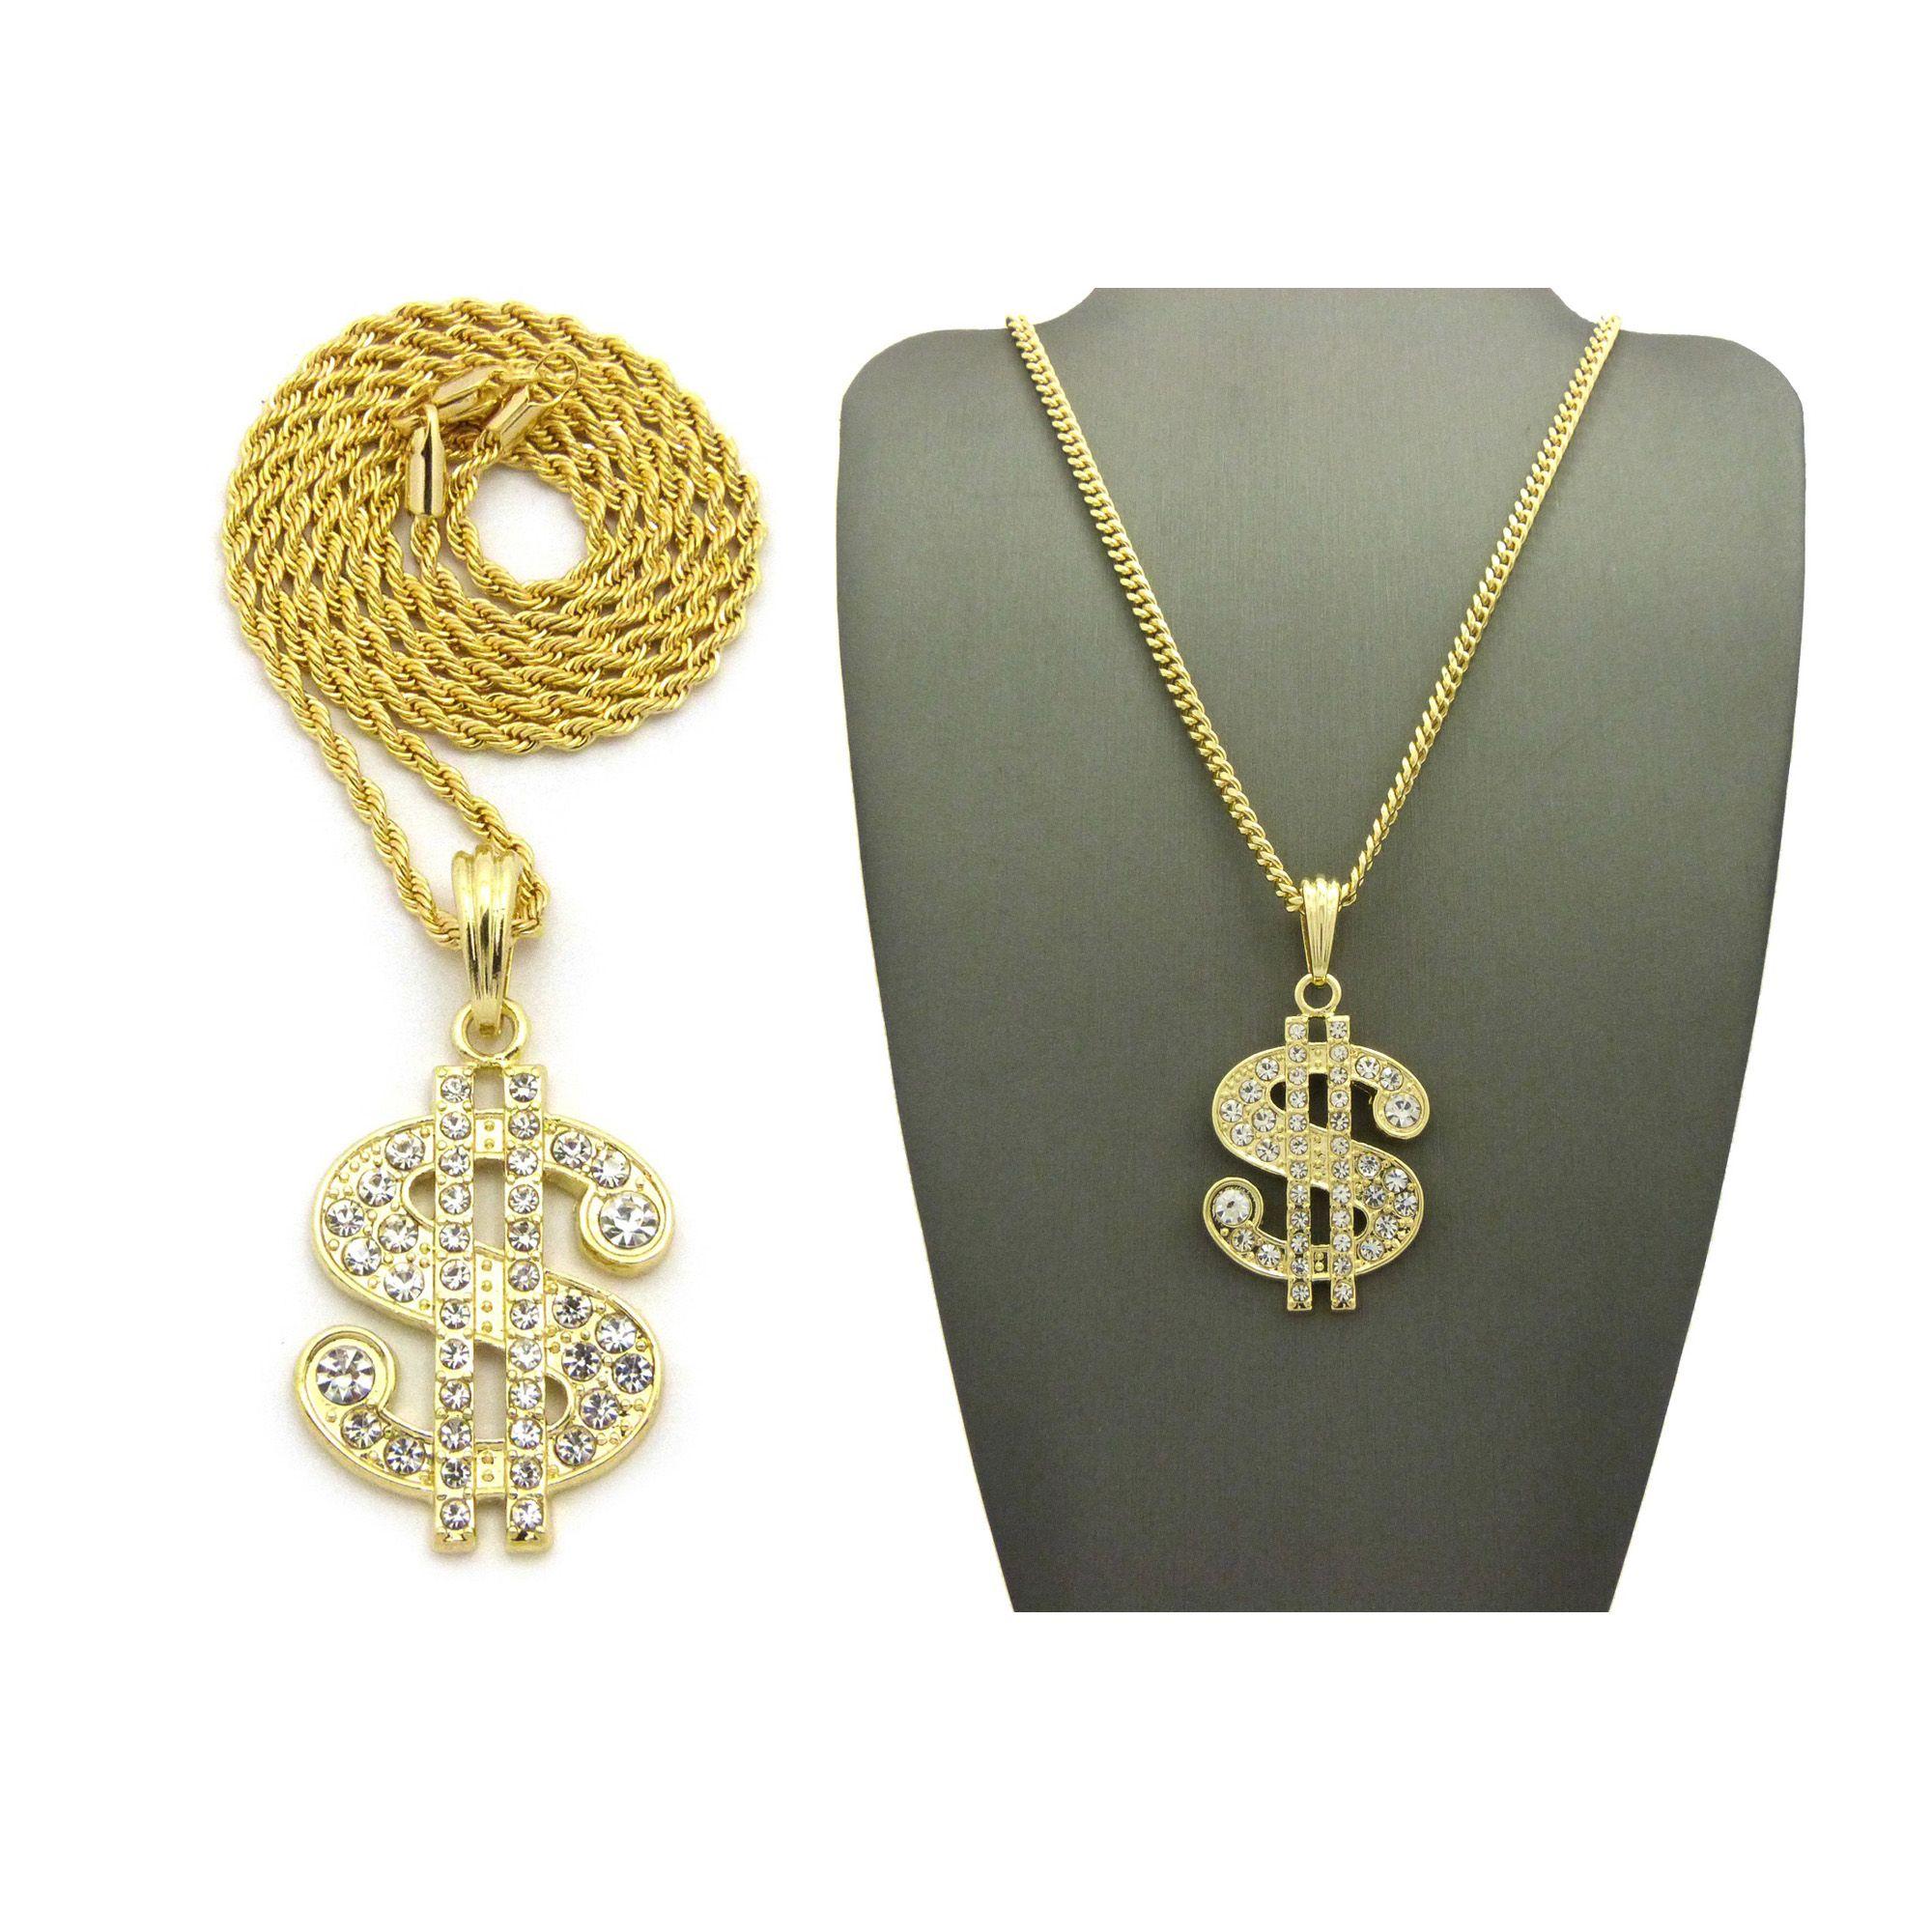 Iced out dollar sign pendant 24 boxcubanrope chain hip hop dollar sign pendant 24 chain hip hop necklaces aloadofball Images